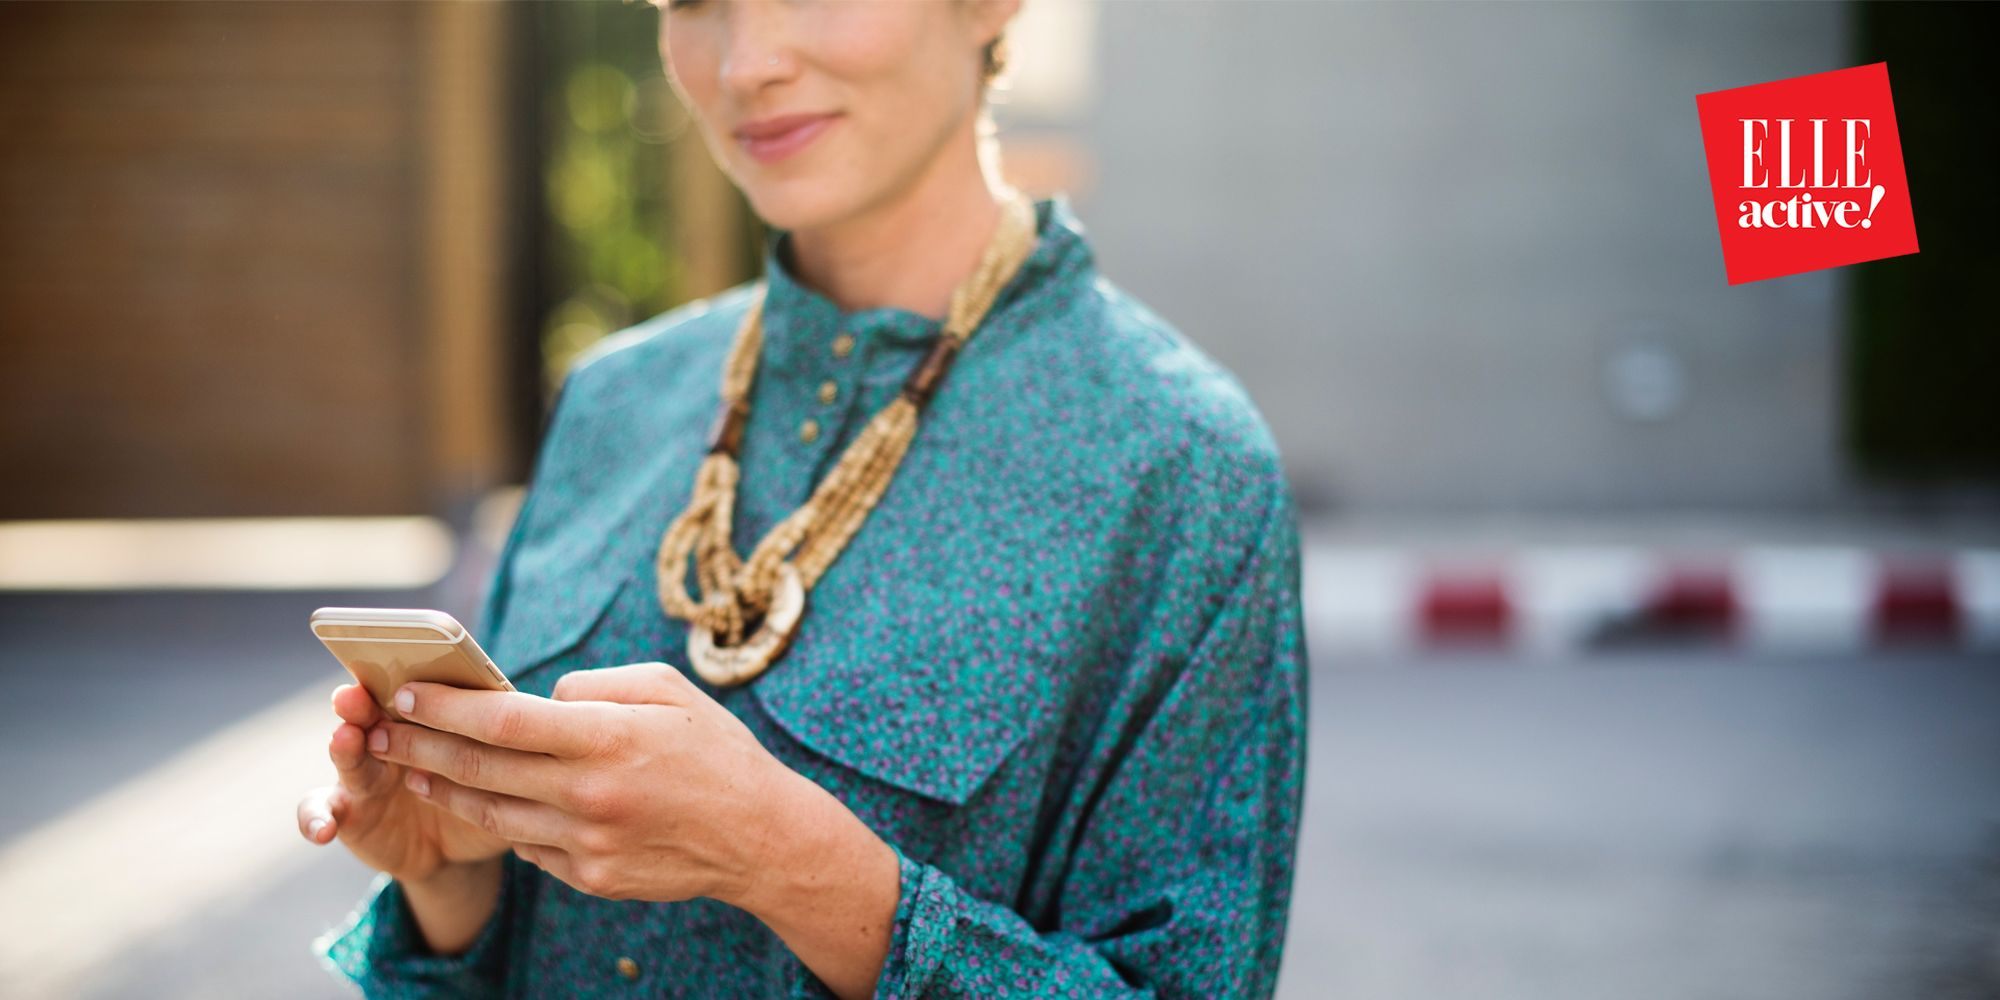 Imprenditoria femminile finanziamenti: 3 storie di successo